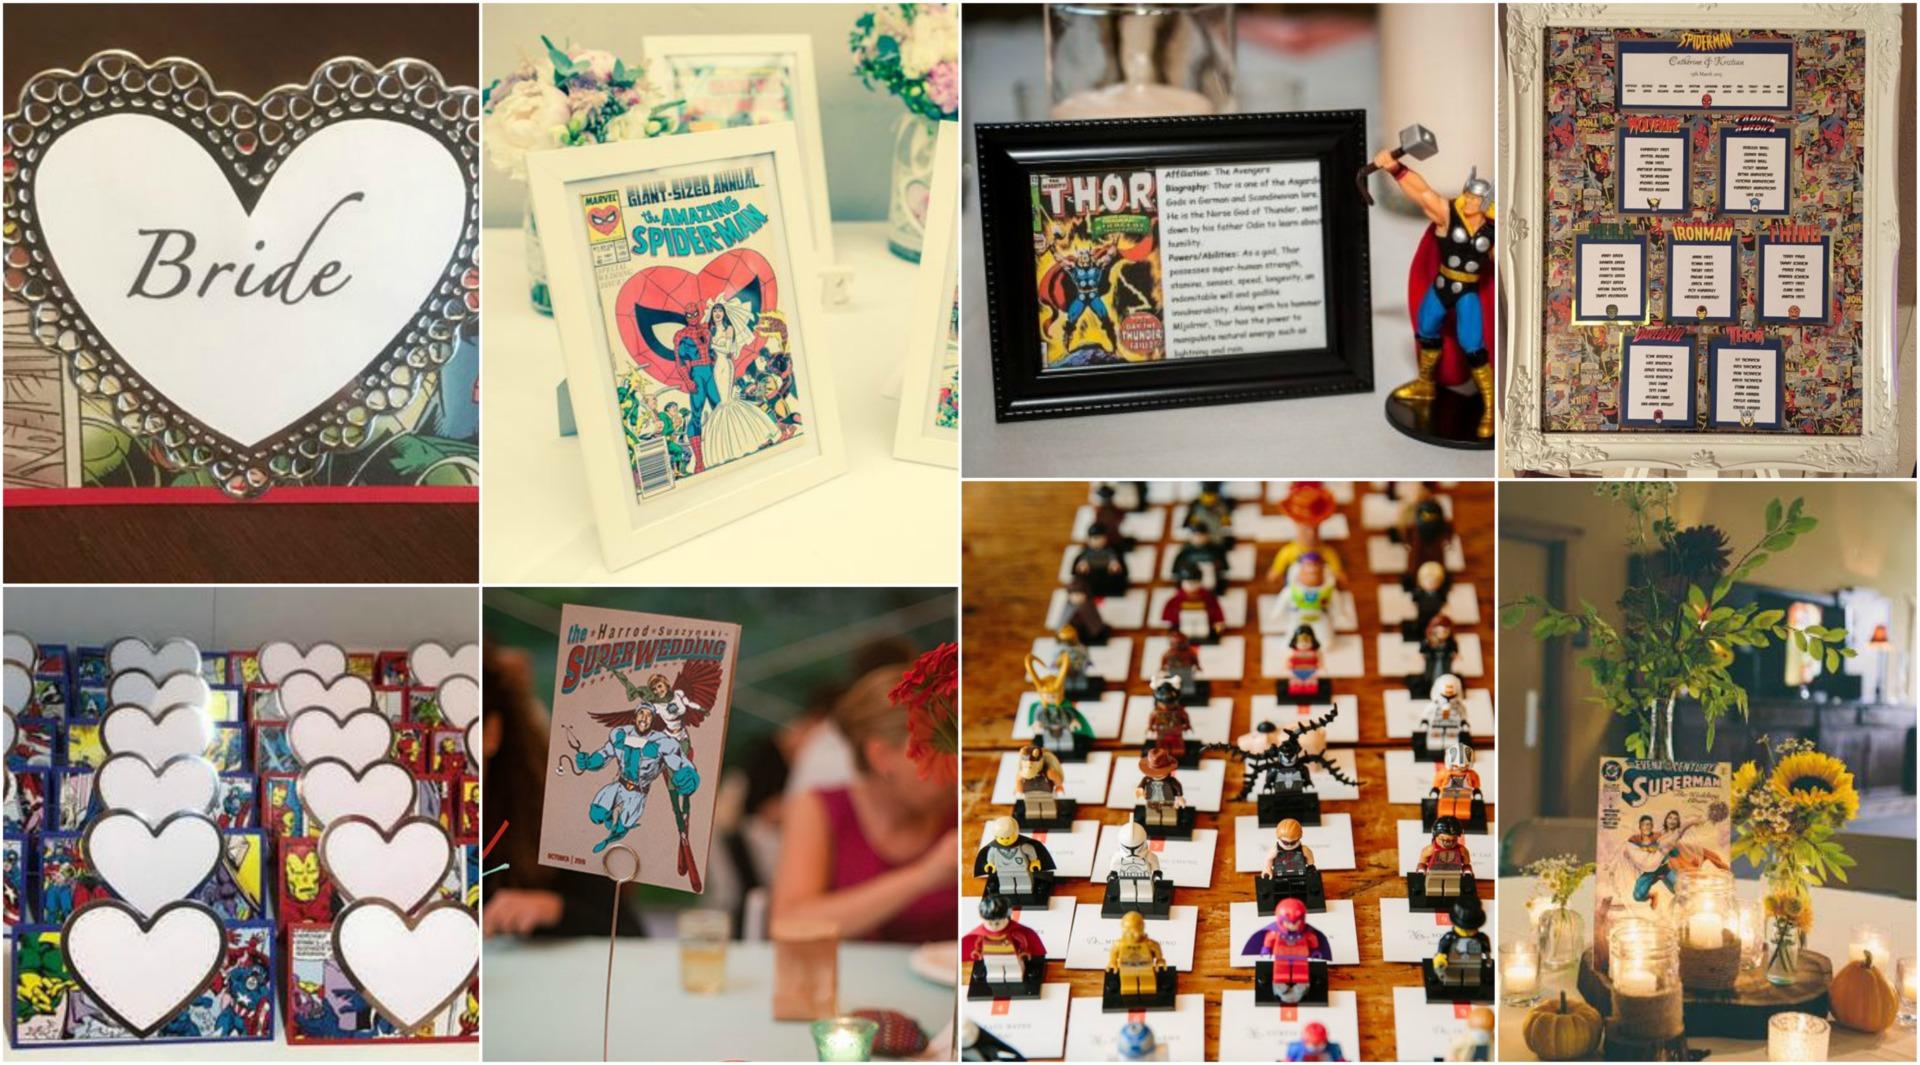 Superhero Wedding Book Superhero Wedding Spiderman Wedding Guest Book